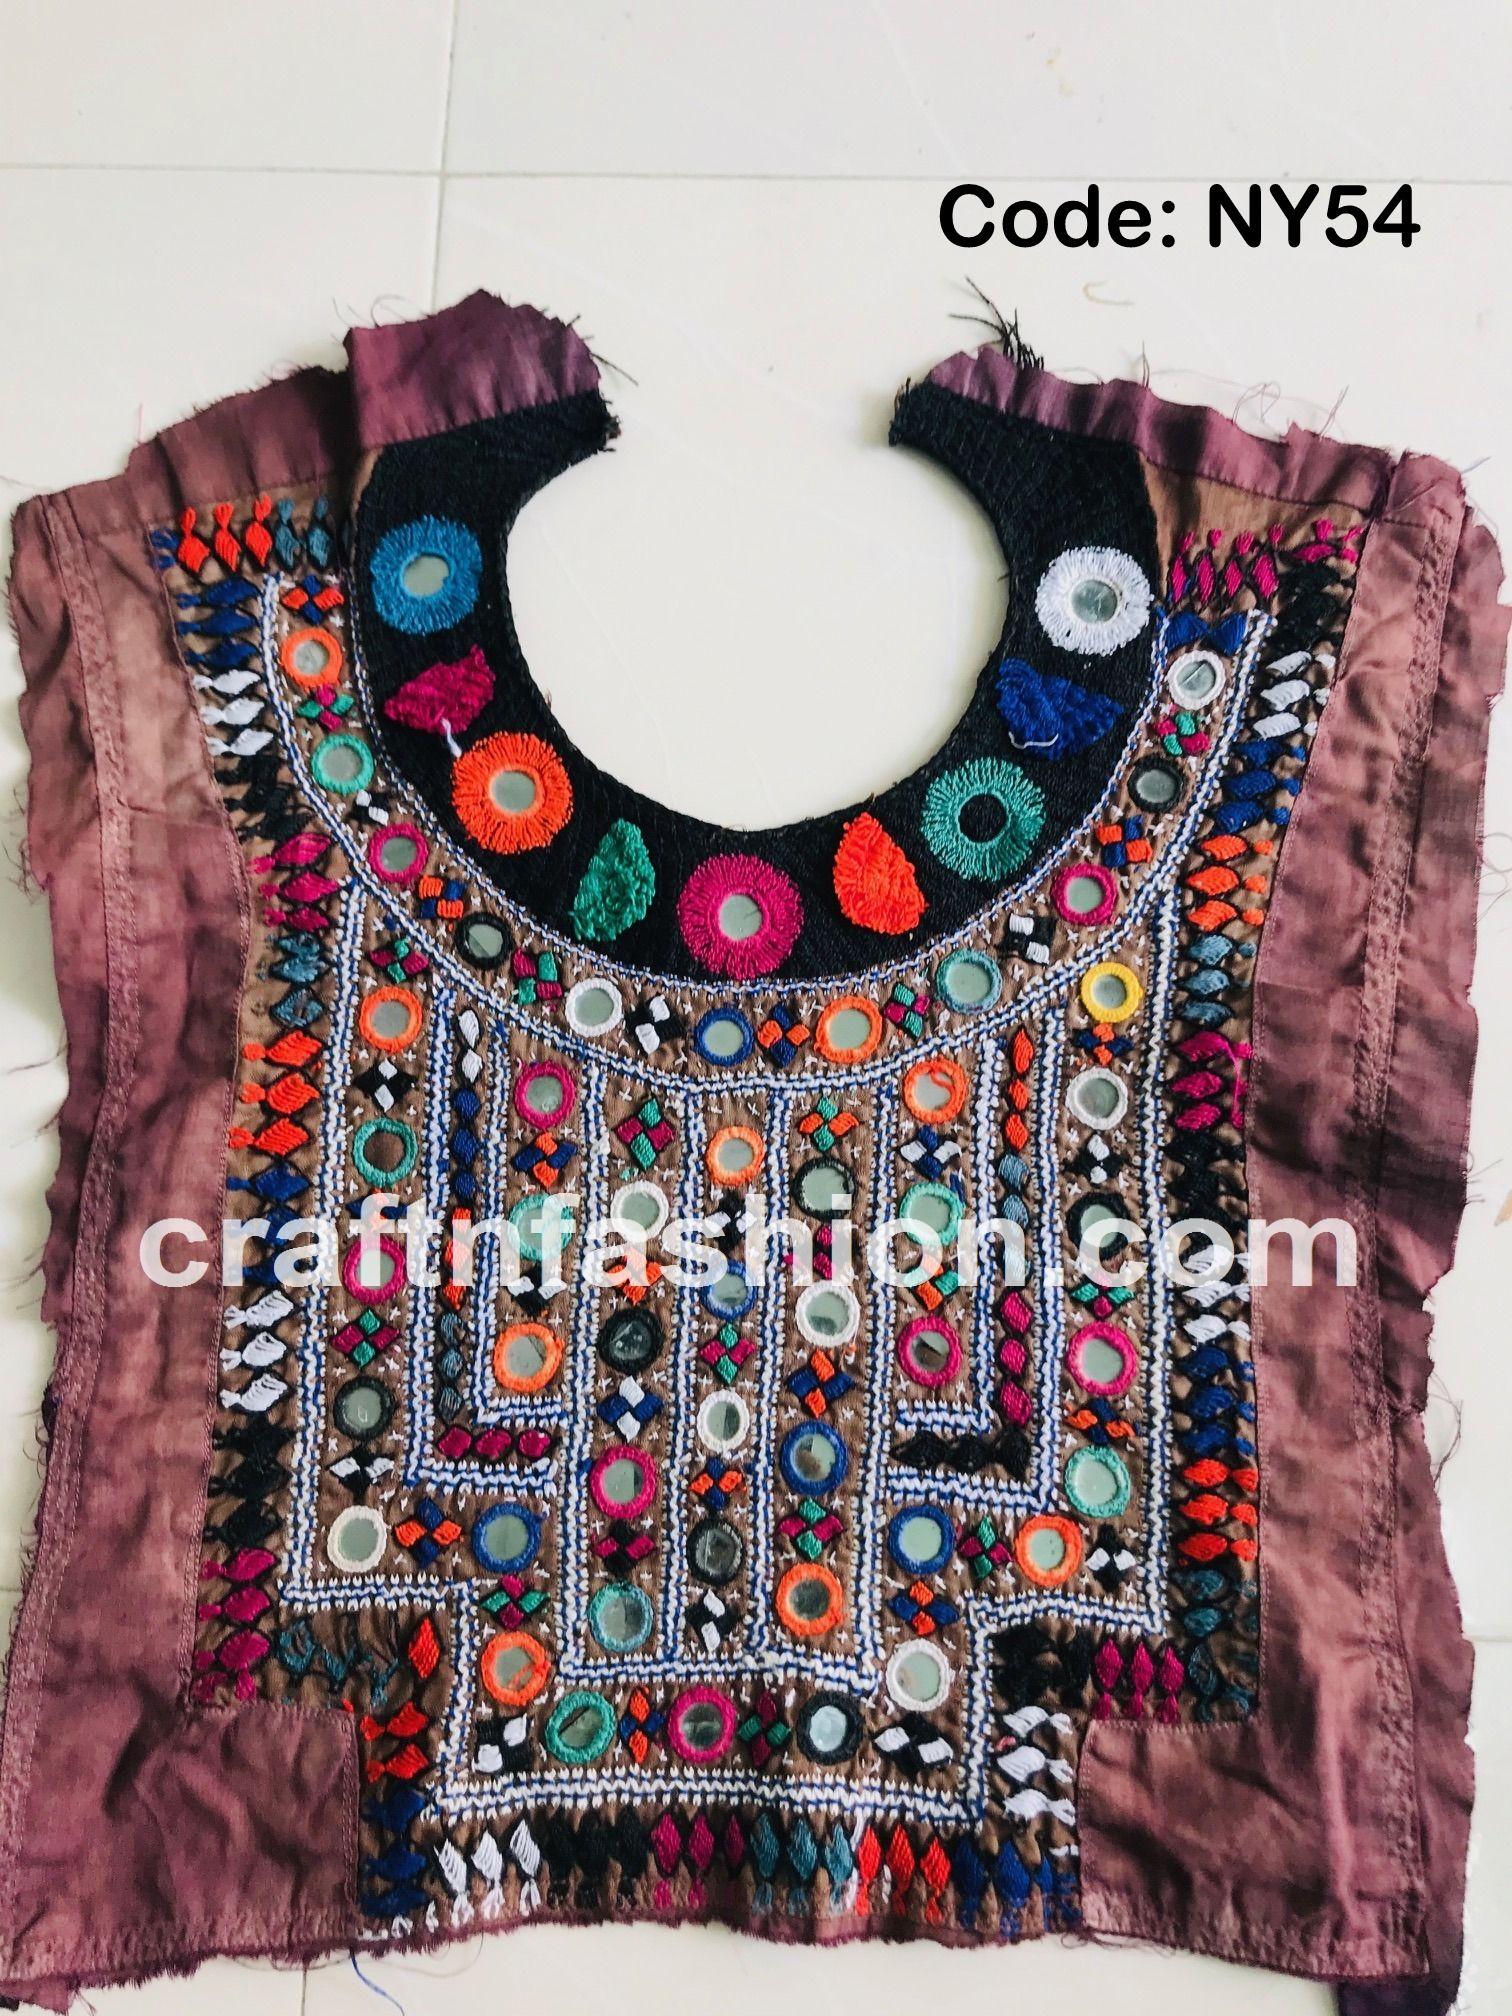 Vintage Handmade Boho Patch Sindh Hand Embroidery Patches Mirror Work Neck Yoke Traditional Gujarati Neck Patch Navratri Dress Yoke